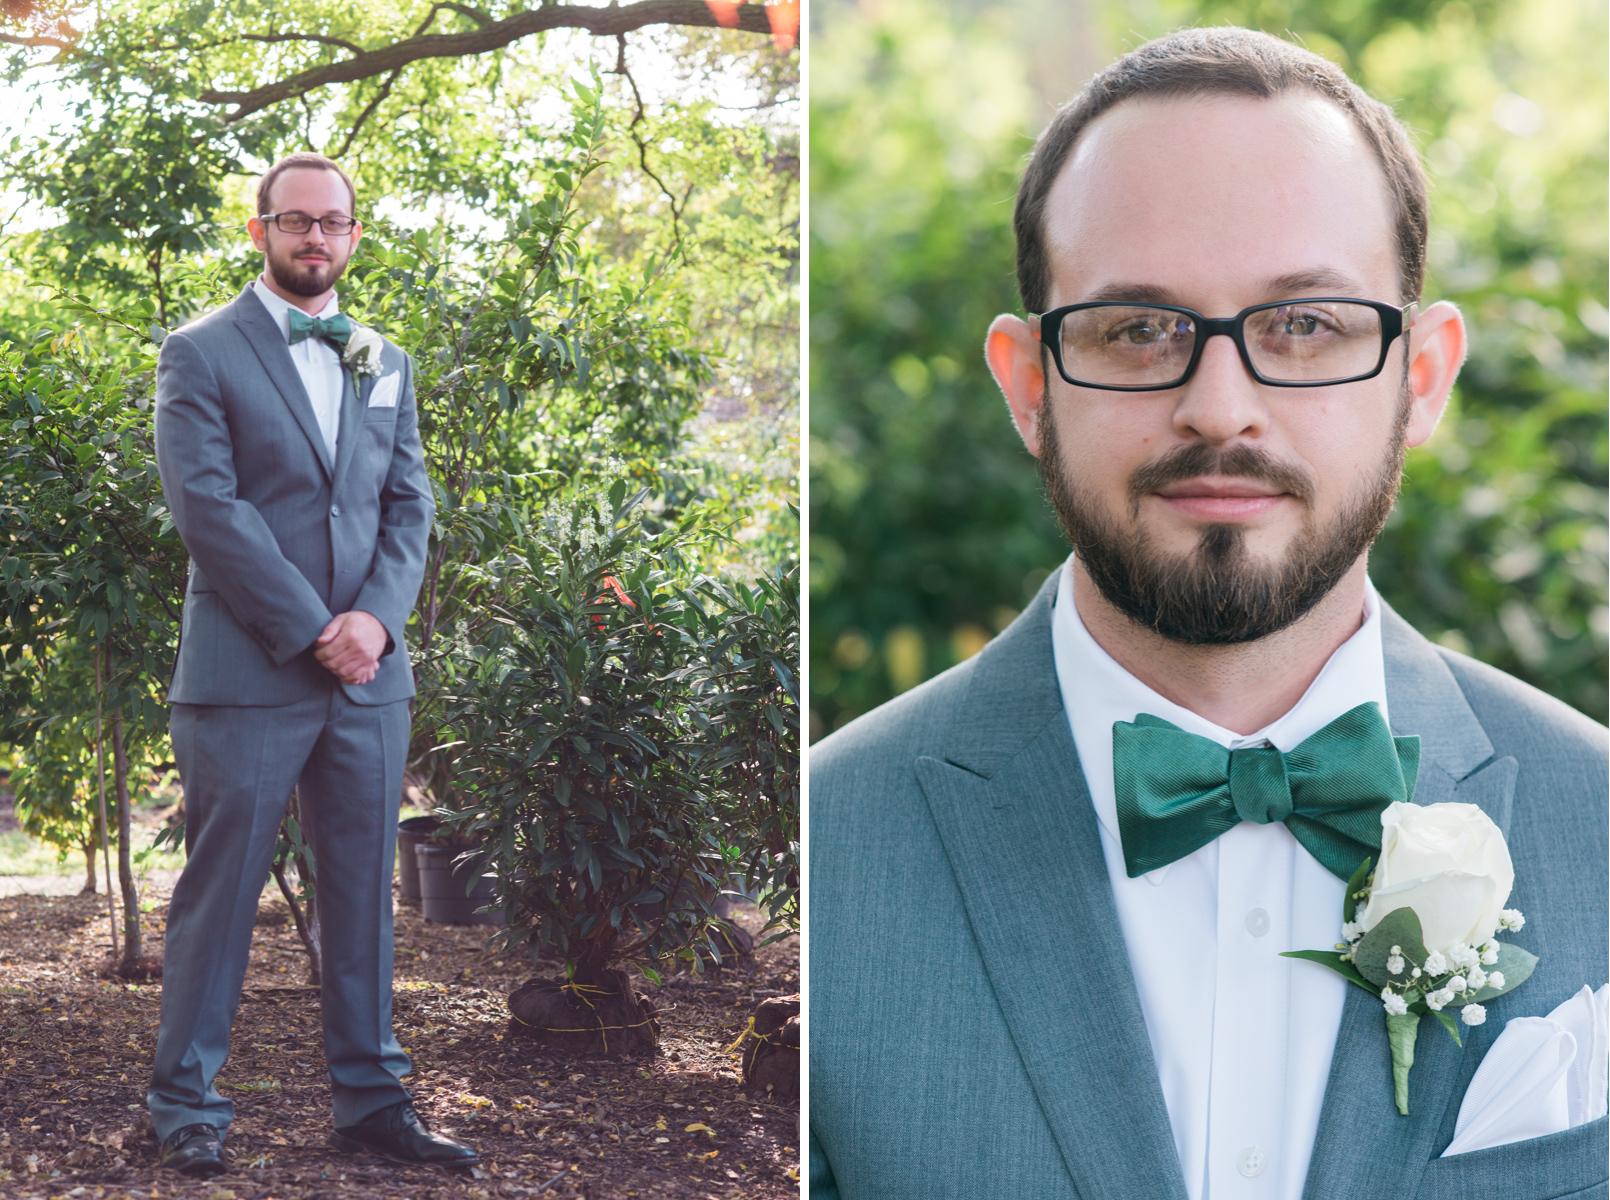 detroit documentary wedding photographer - mx-028